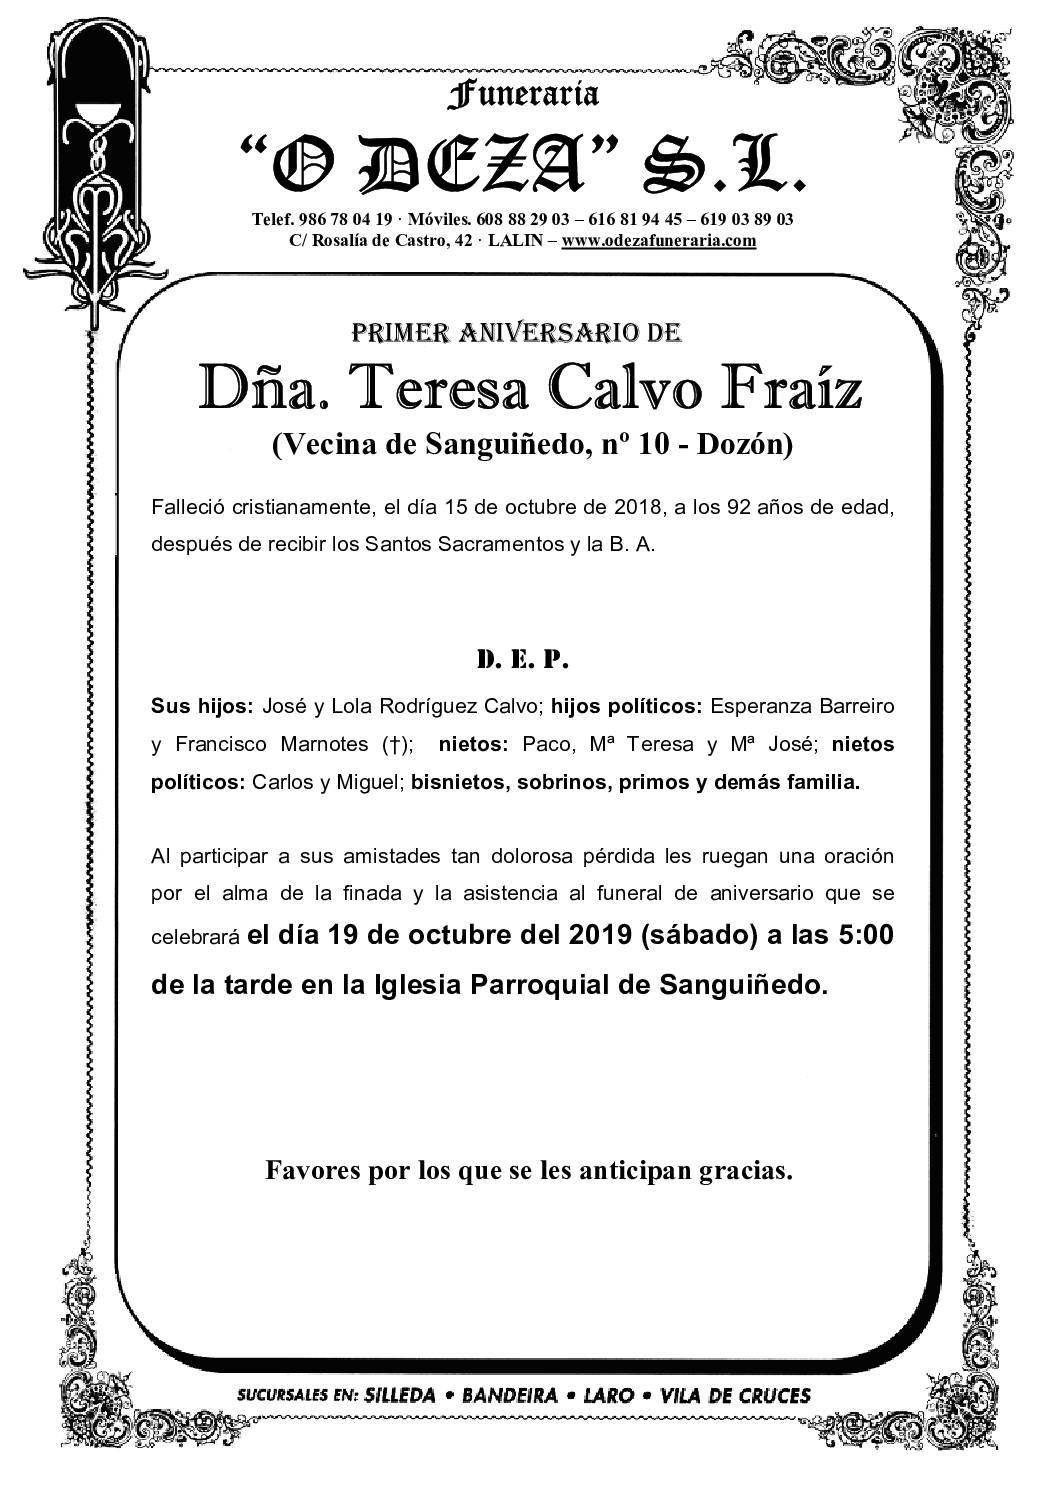 DÑA. TERESA CALVO FRAÍZ